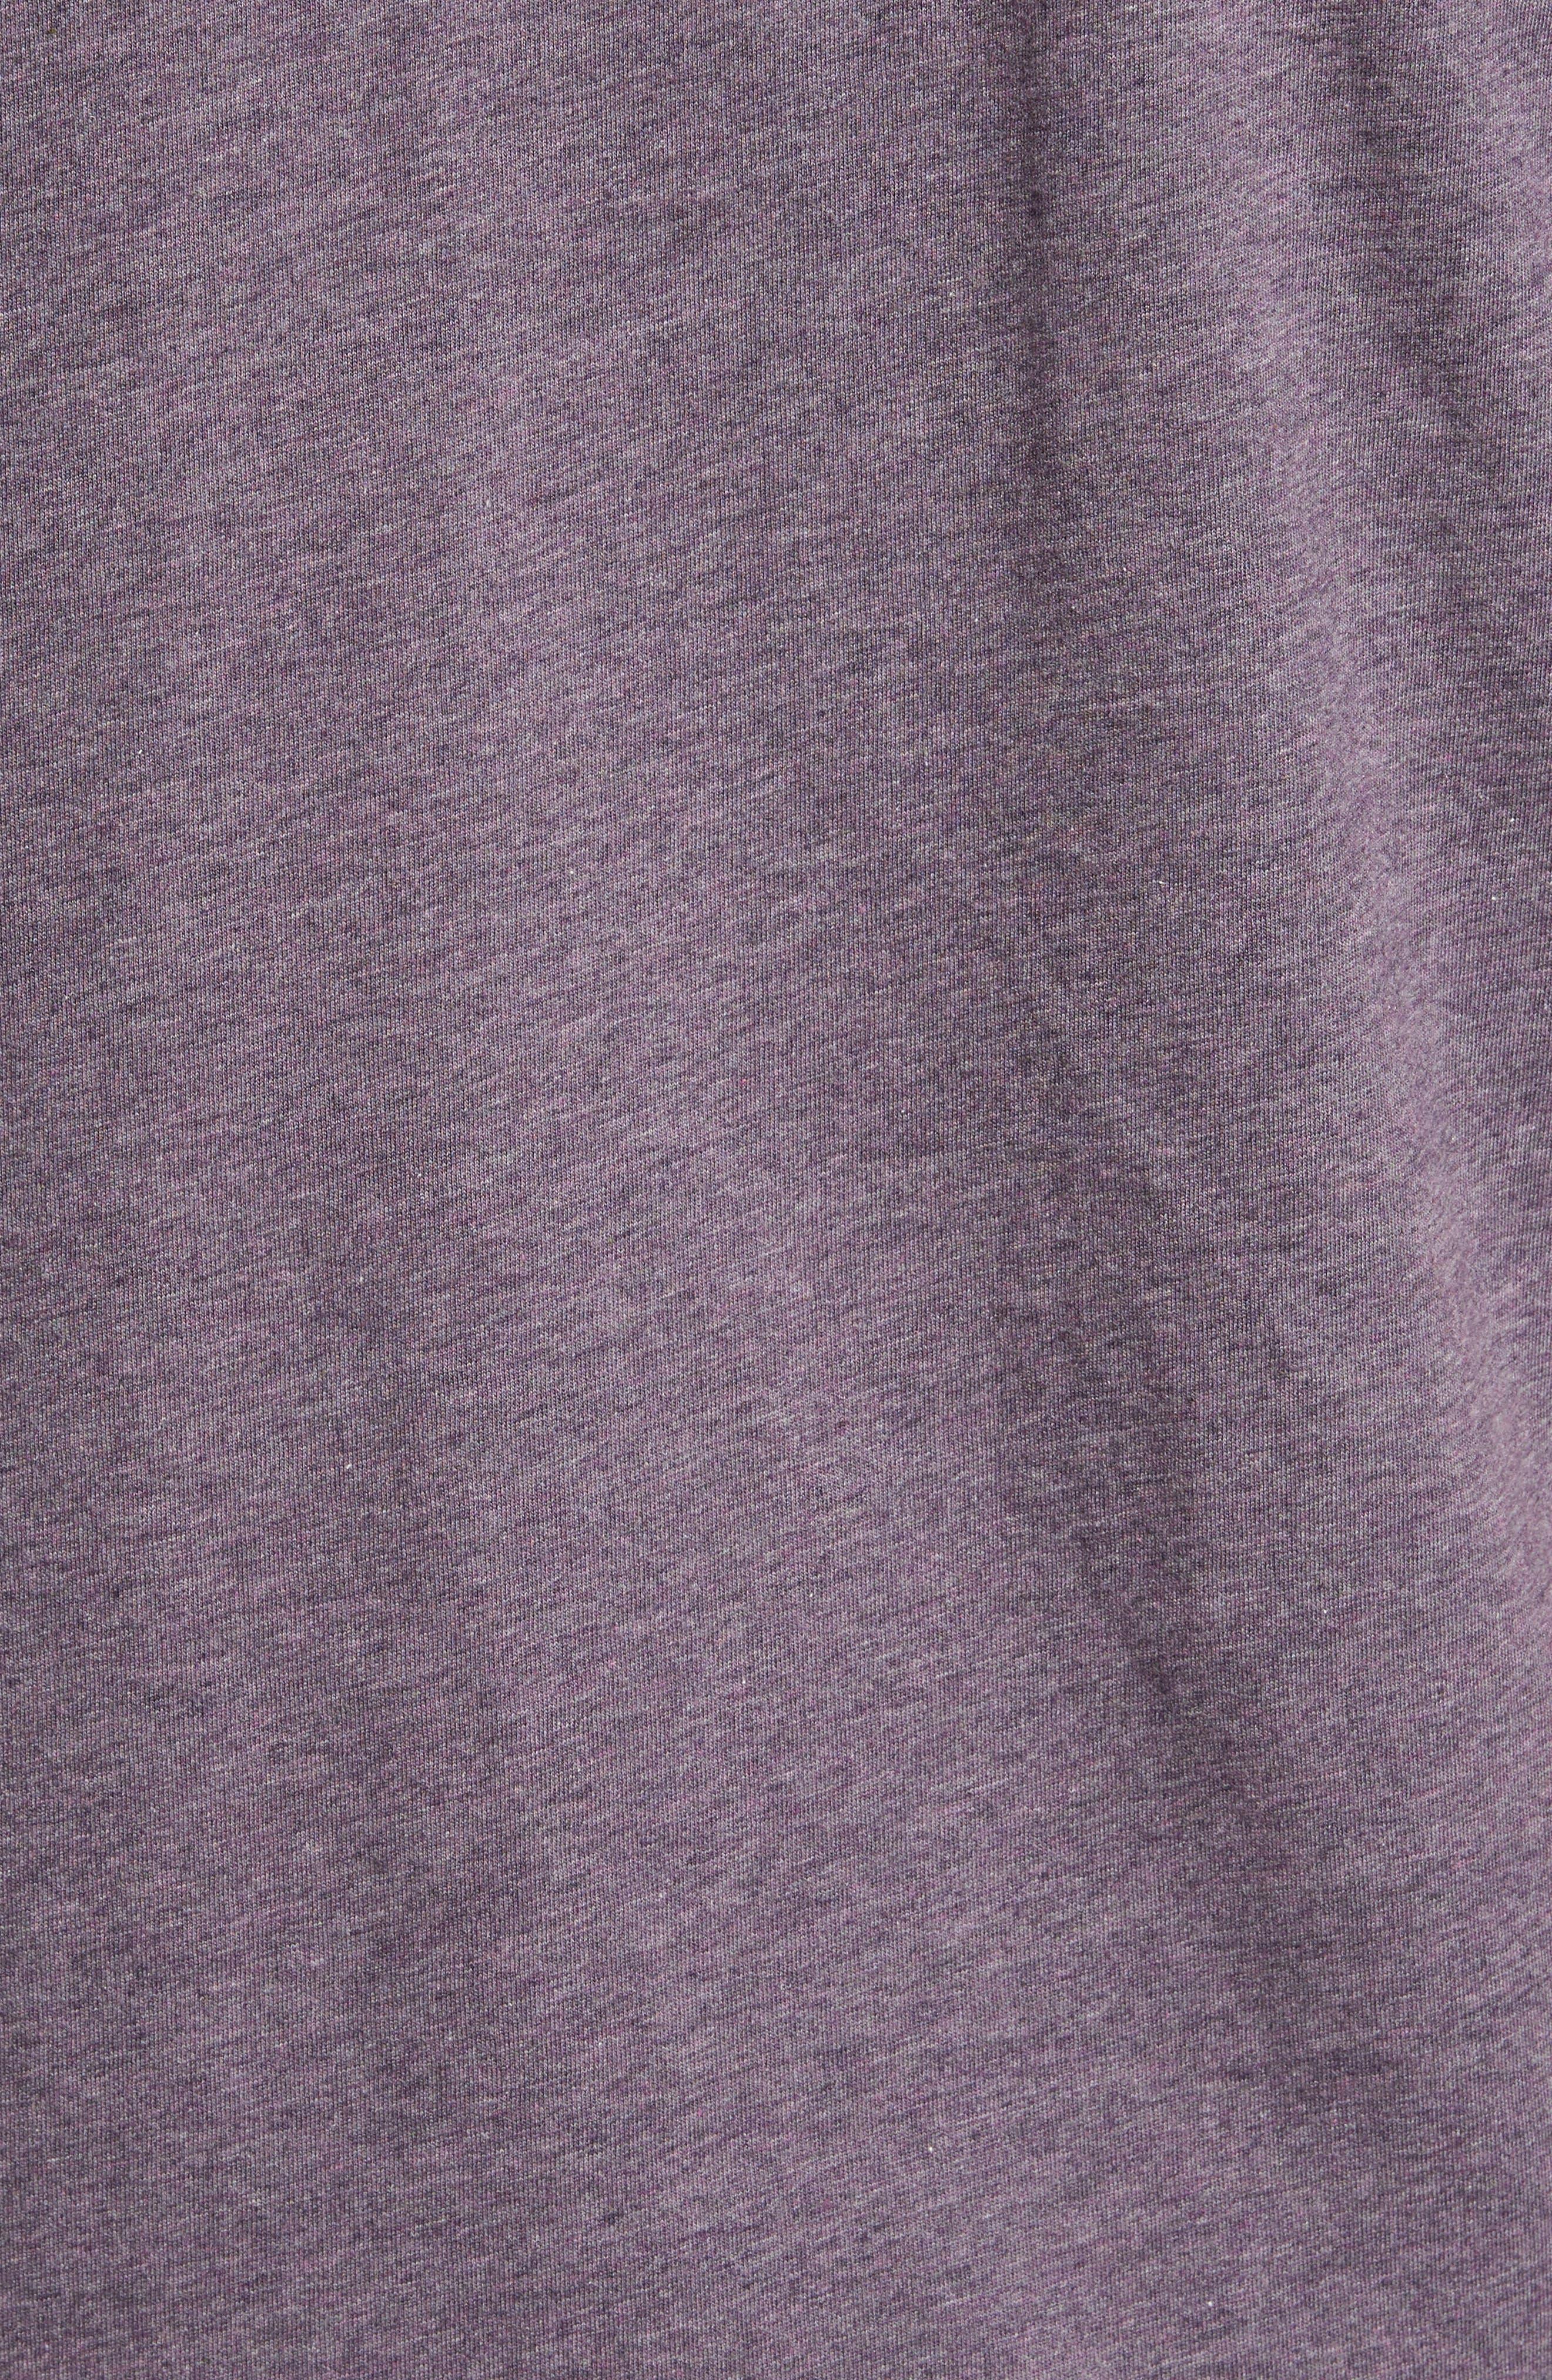 V-Neck T-Shirt,                             Alternate thumbnail 36, color,